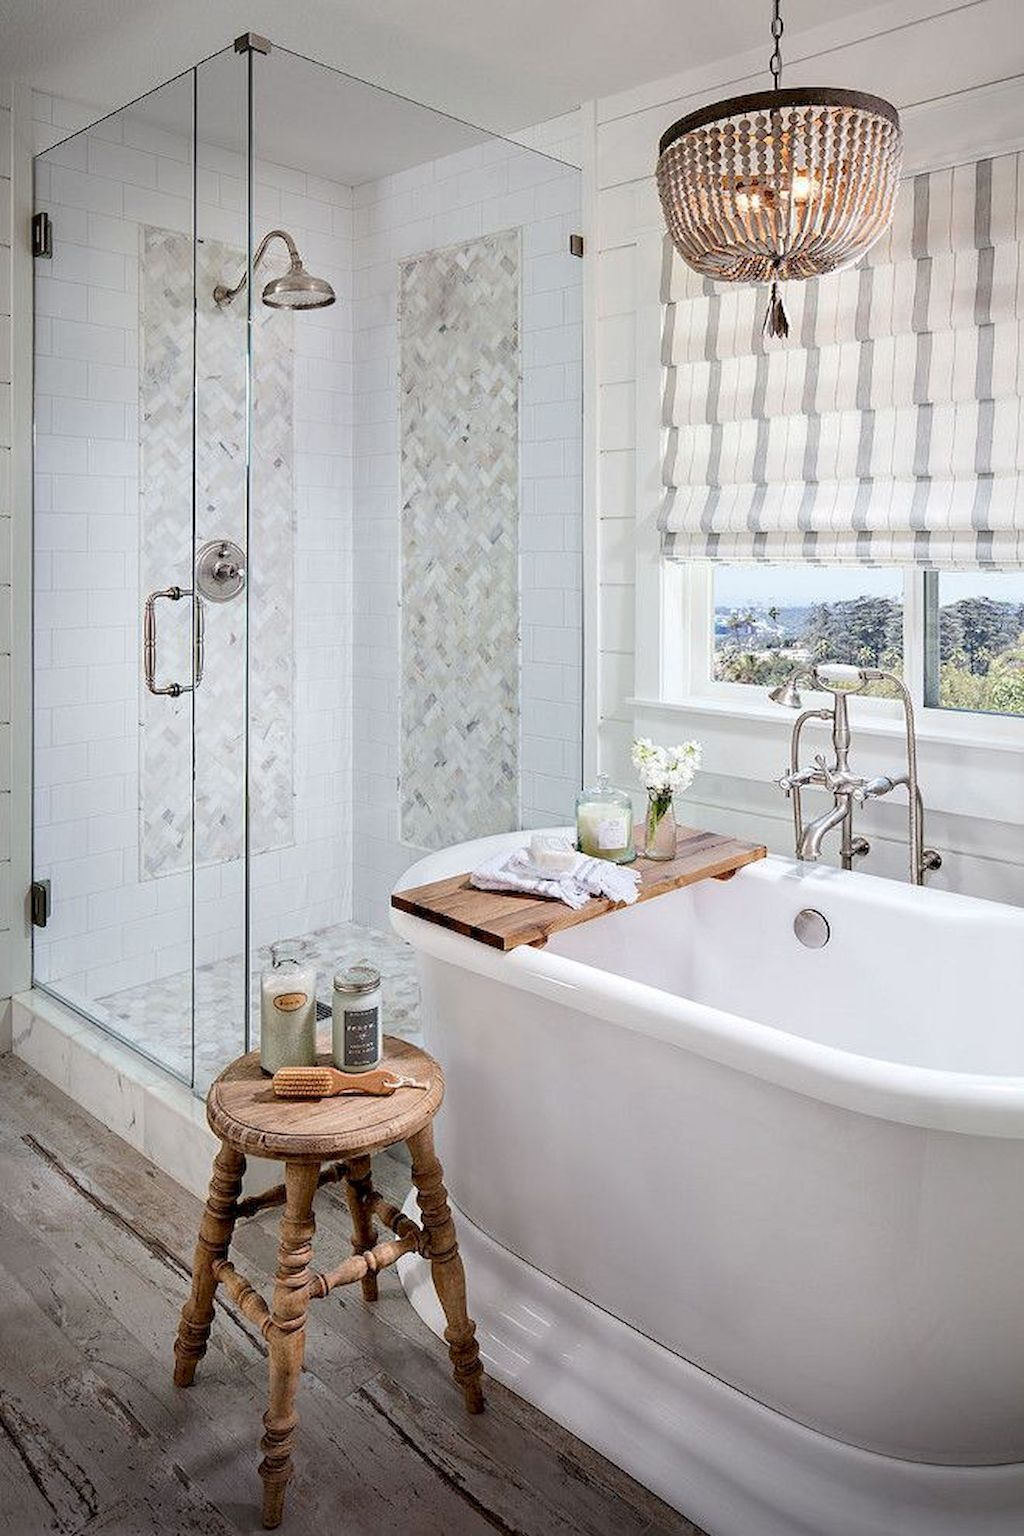 40 Rustic Farmhouse Master Bathroom Remodel Ideas   Master bathroom ...